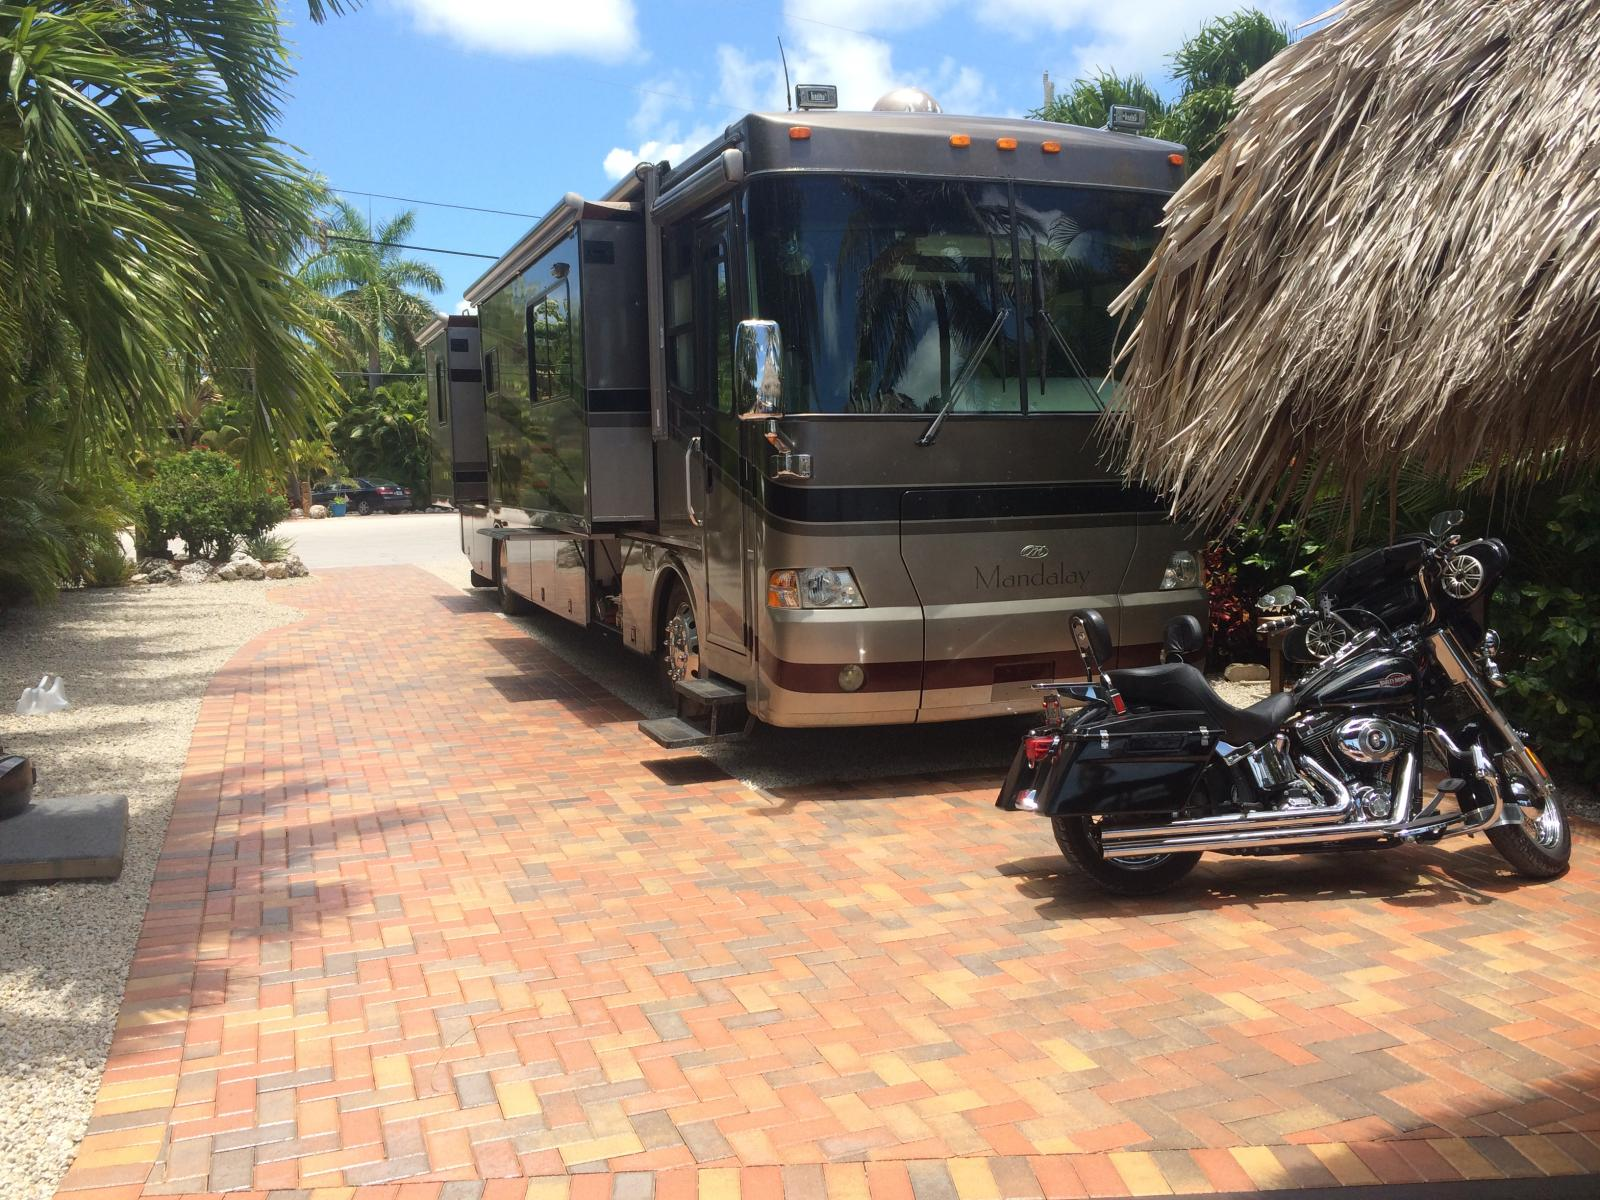 one of many trips to Key West